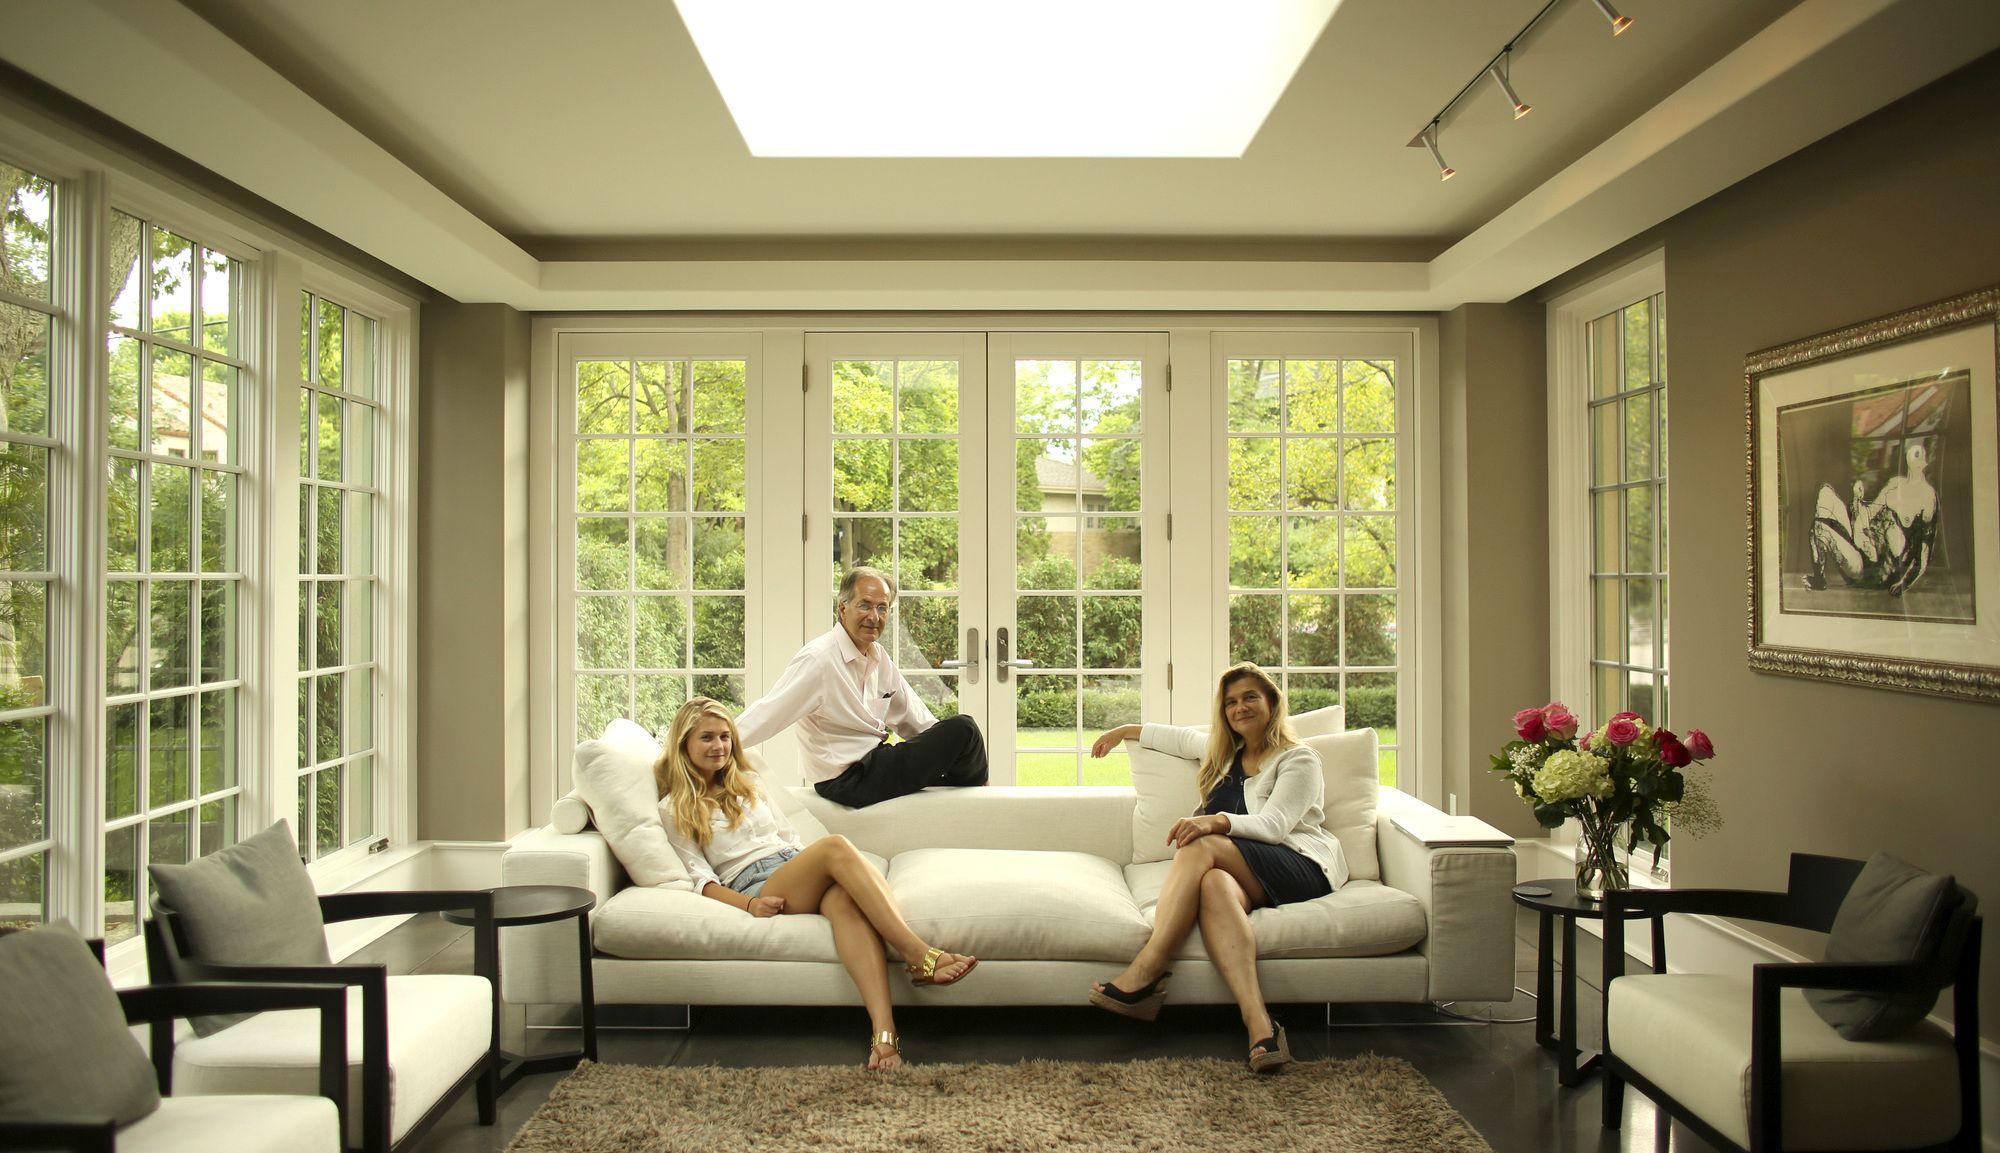 furniture excellent contemporary sunroom design. 14 Best Sunroom Images On Pinterest Ideas Porch And Small Furniture Excellent Contemporary Design O